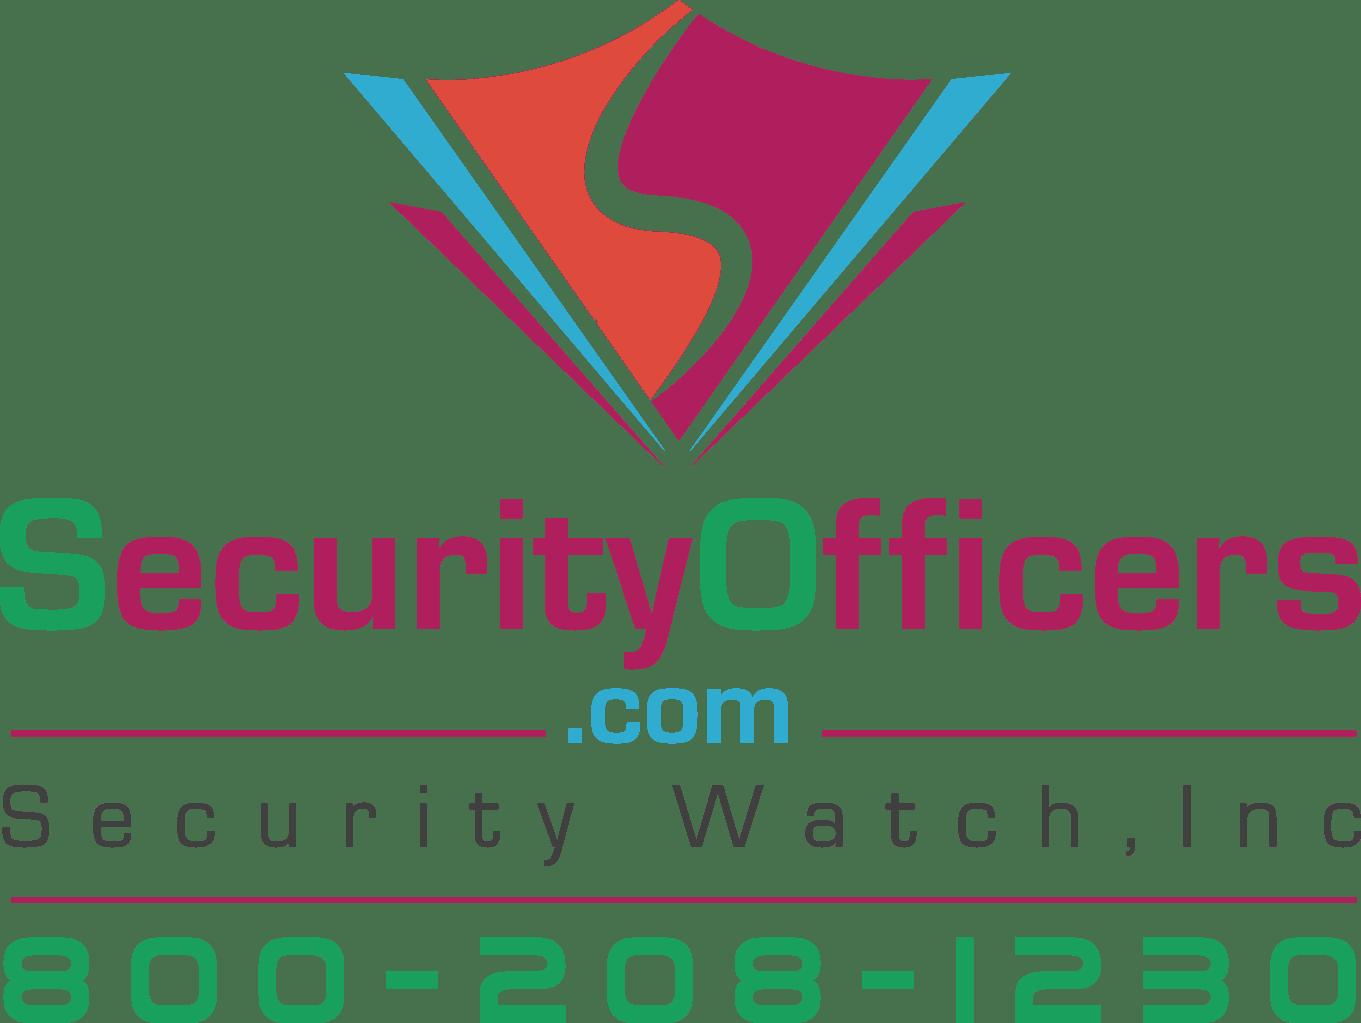 Security Watch, Inc - Logo - Final Files